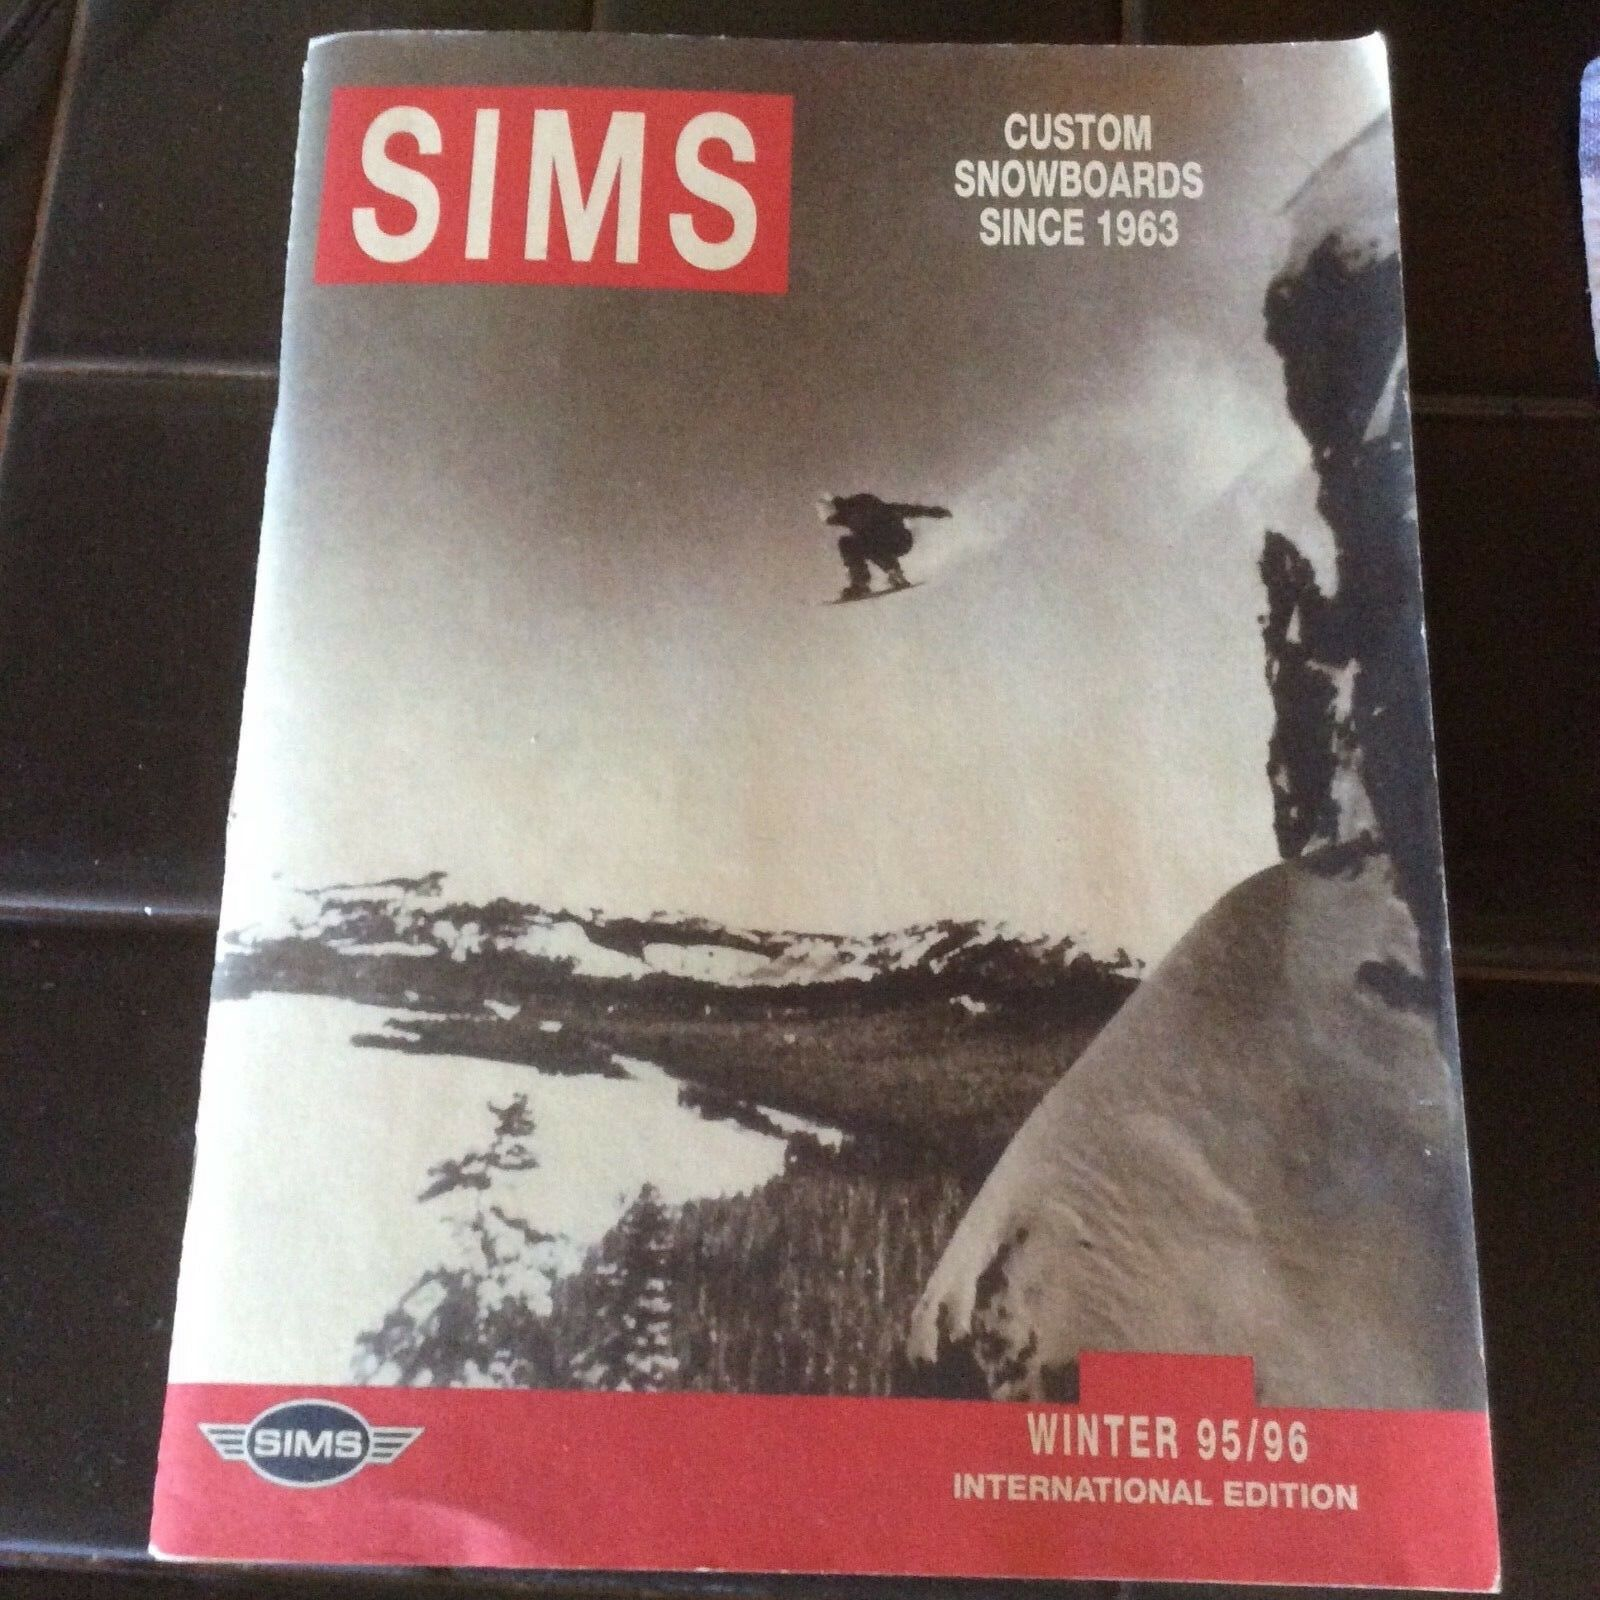 Sims vintage 1995 96 international poster catalog oldschool